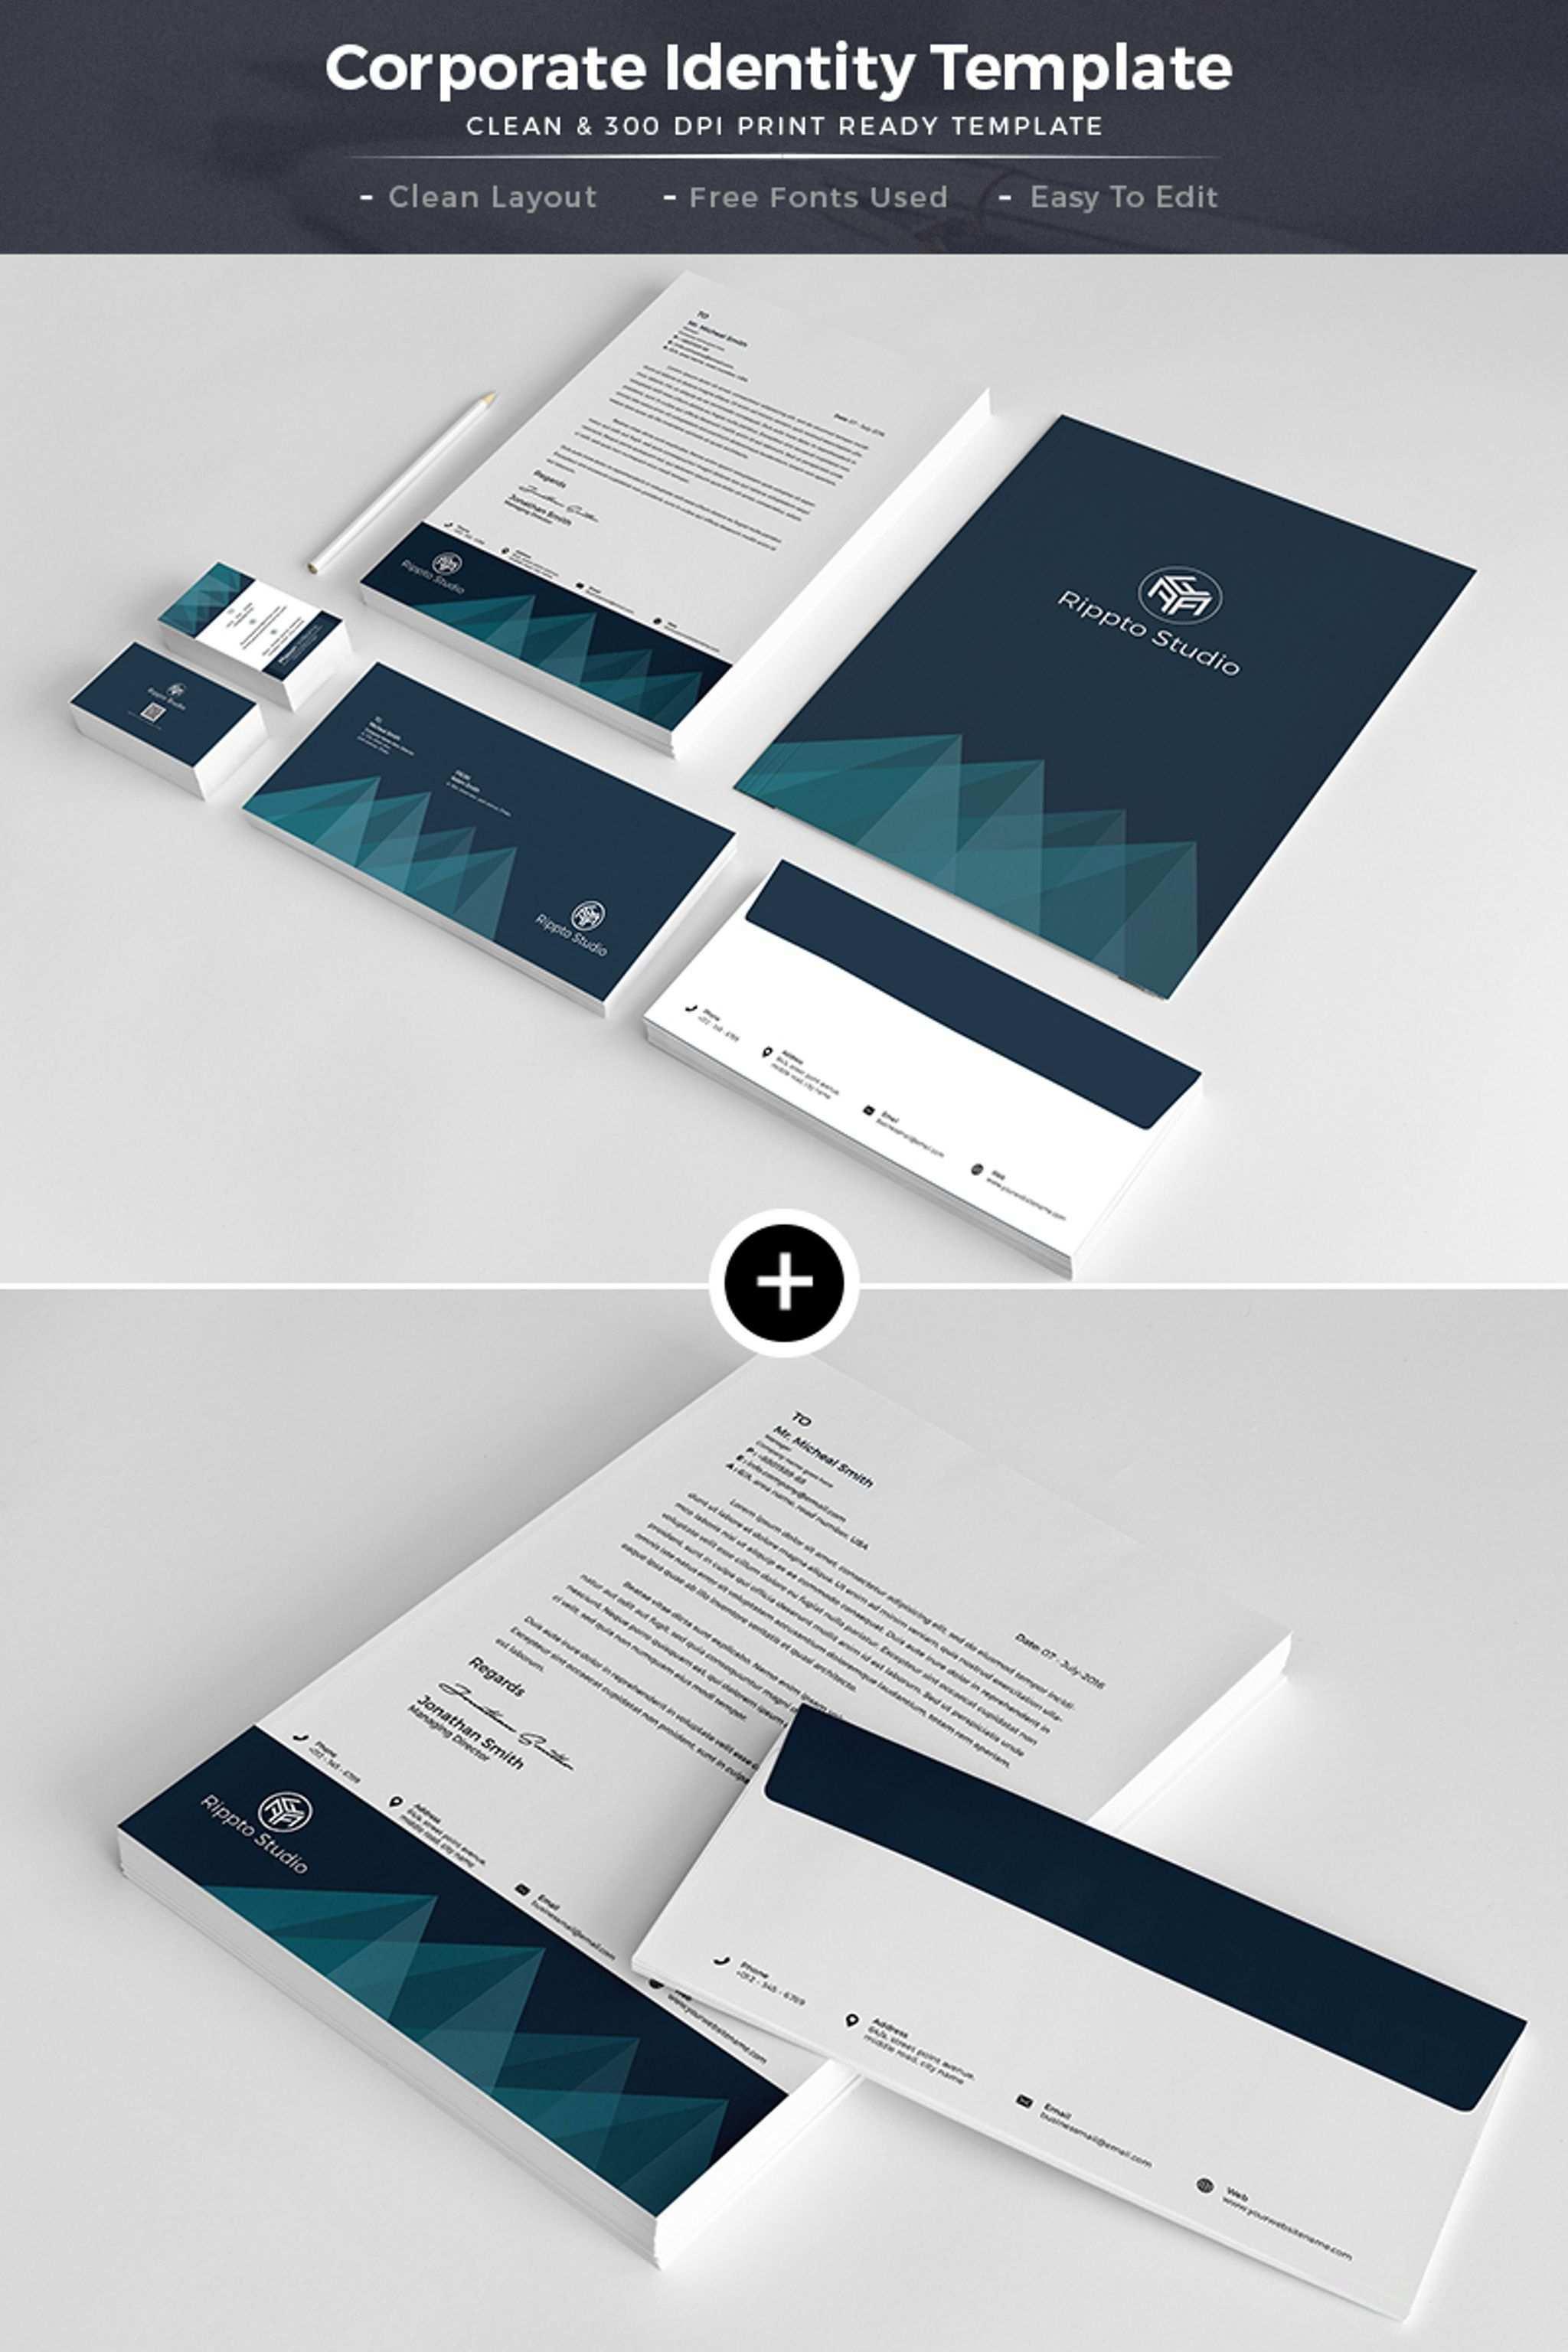 Trading Multipurpose Creative Design Corporate Identity Template Corporateidentity Creative Multipurpose Trading V 2020 G Shablony Brendbuk Firmennyj Dizajn